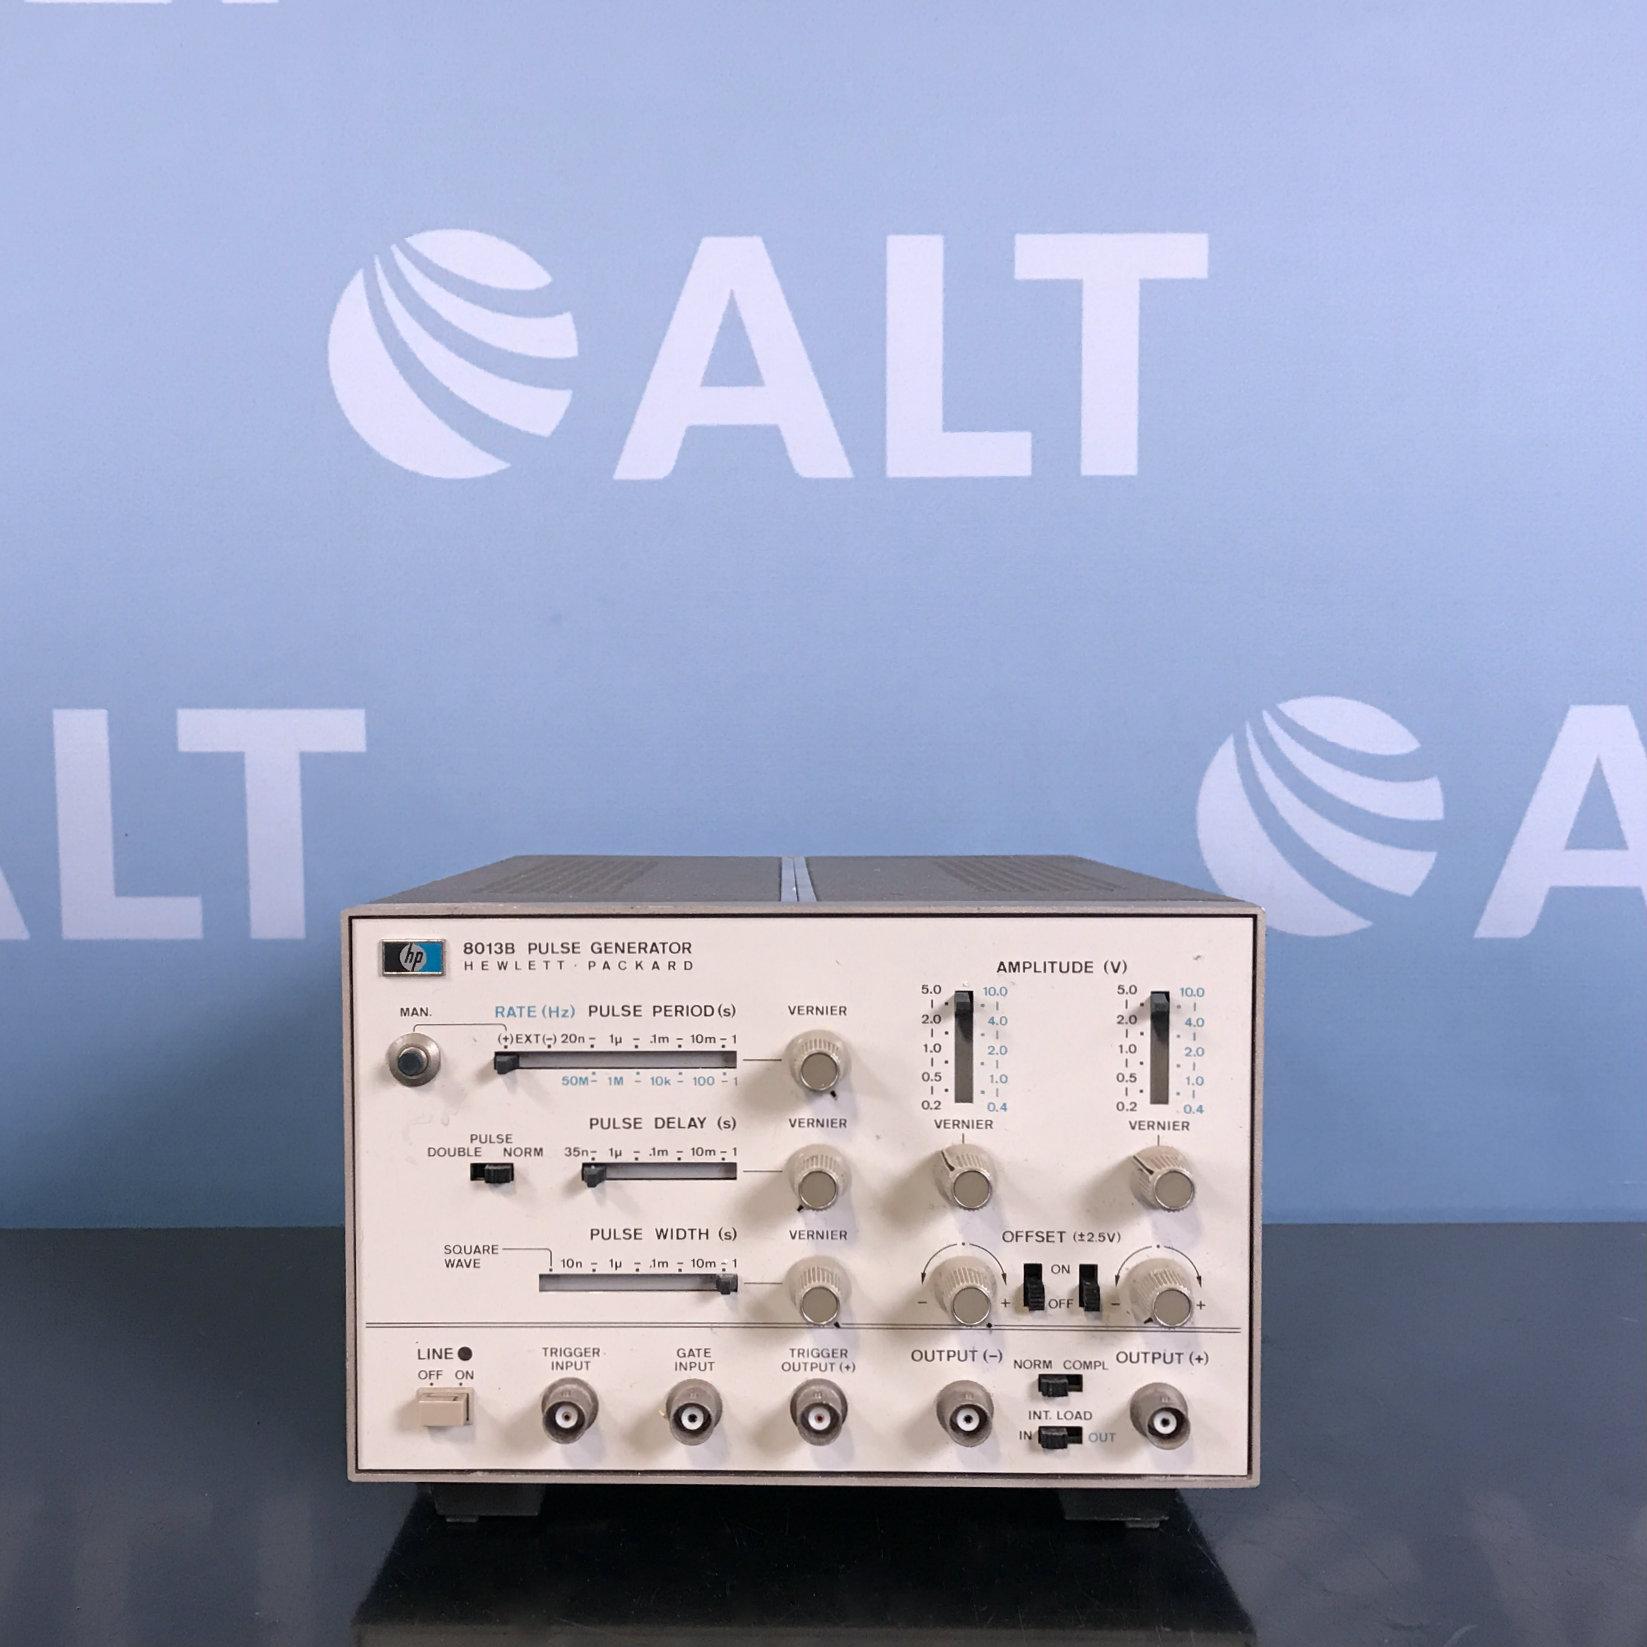 Hewlett Packard 8013B Pulse Generator Image